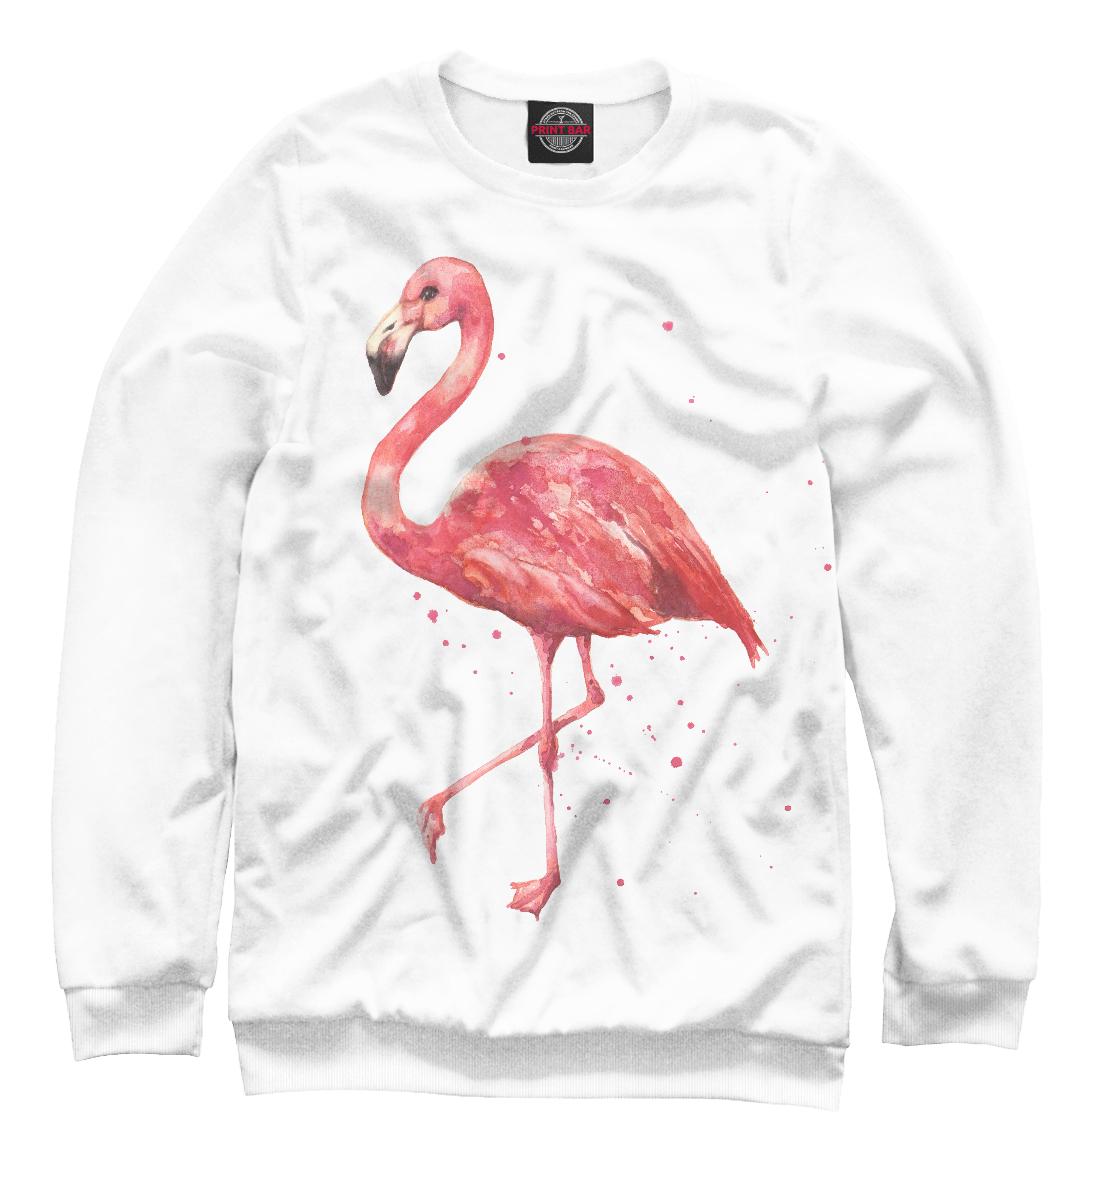 Купить Розовый фламинго, Printbar, Свитшоты, NOV-775945-swi-1